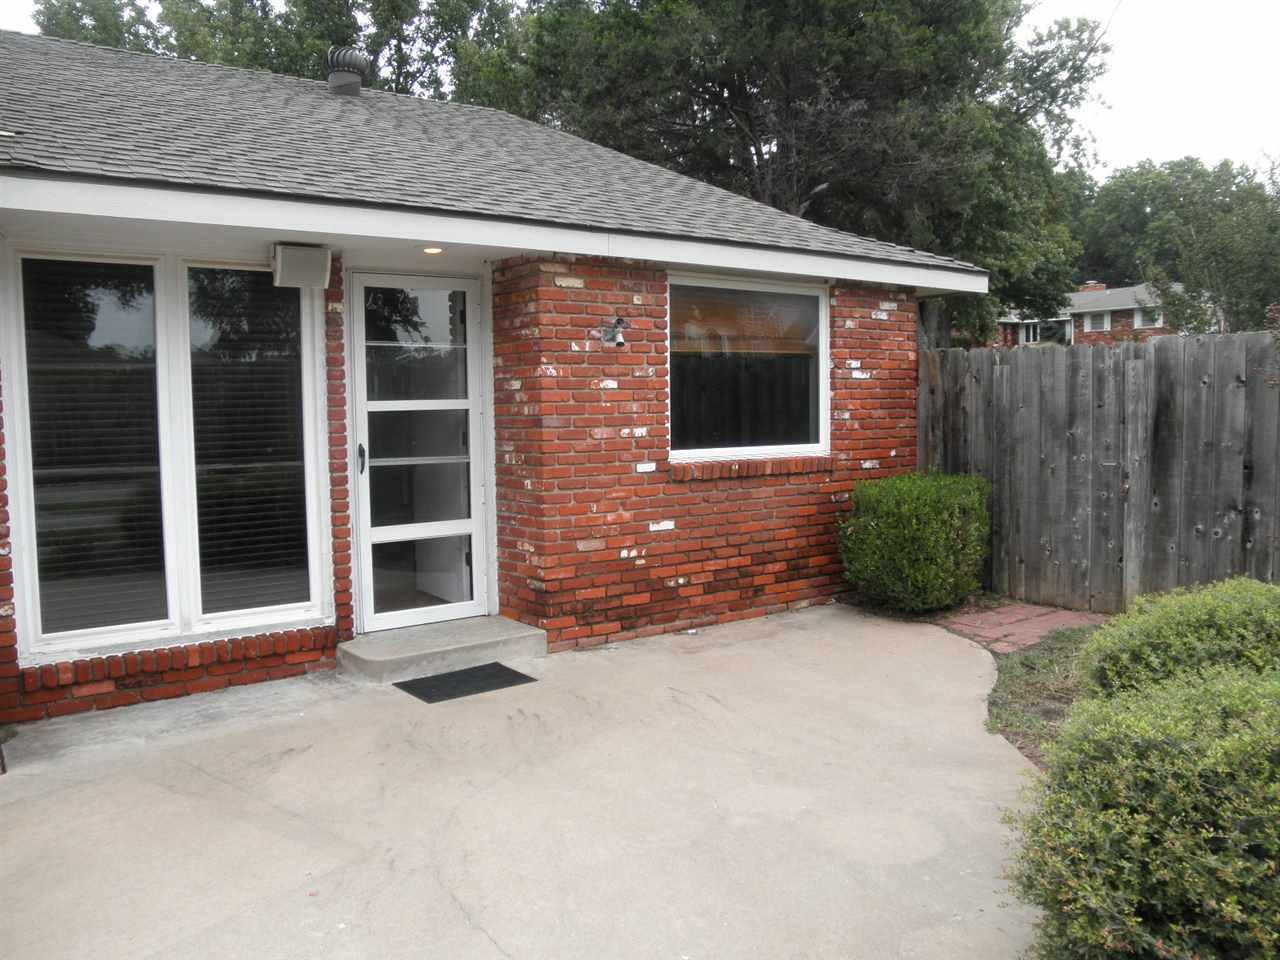 Sold Intraoffice W/MLS | 1404 Meadowbrook Ponca City, OK 74604 22